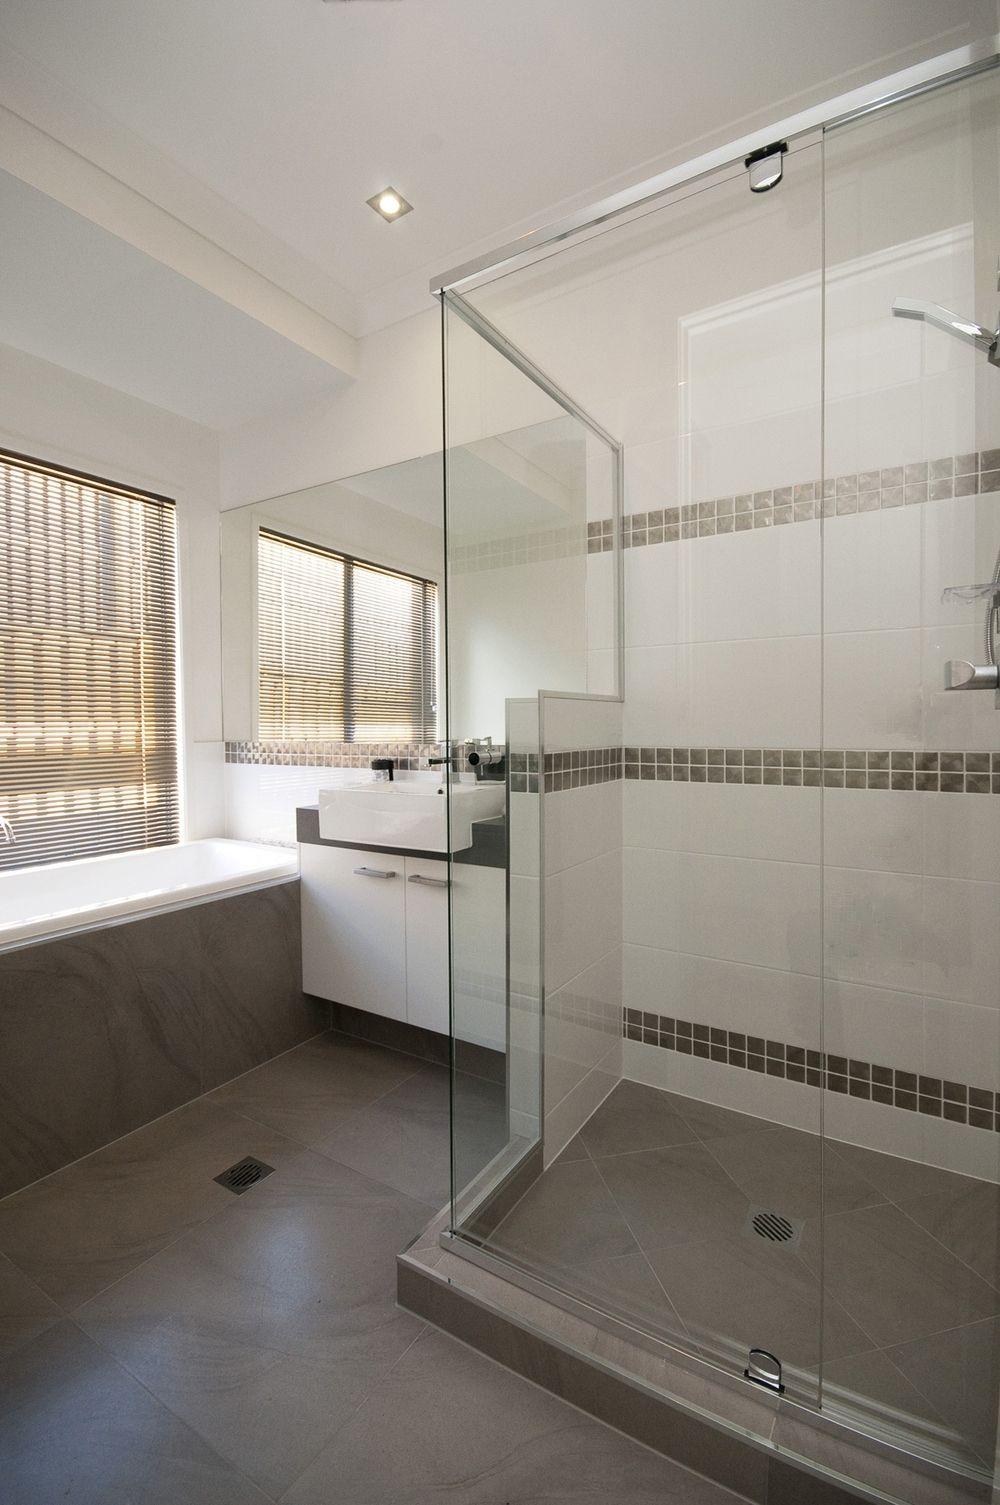 Inspirational Inspirational Small Bathroom Renovation Ideas Nz